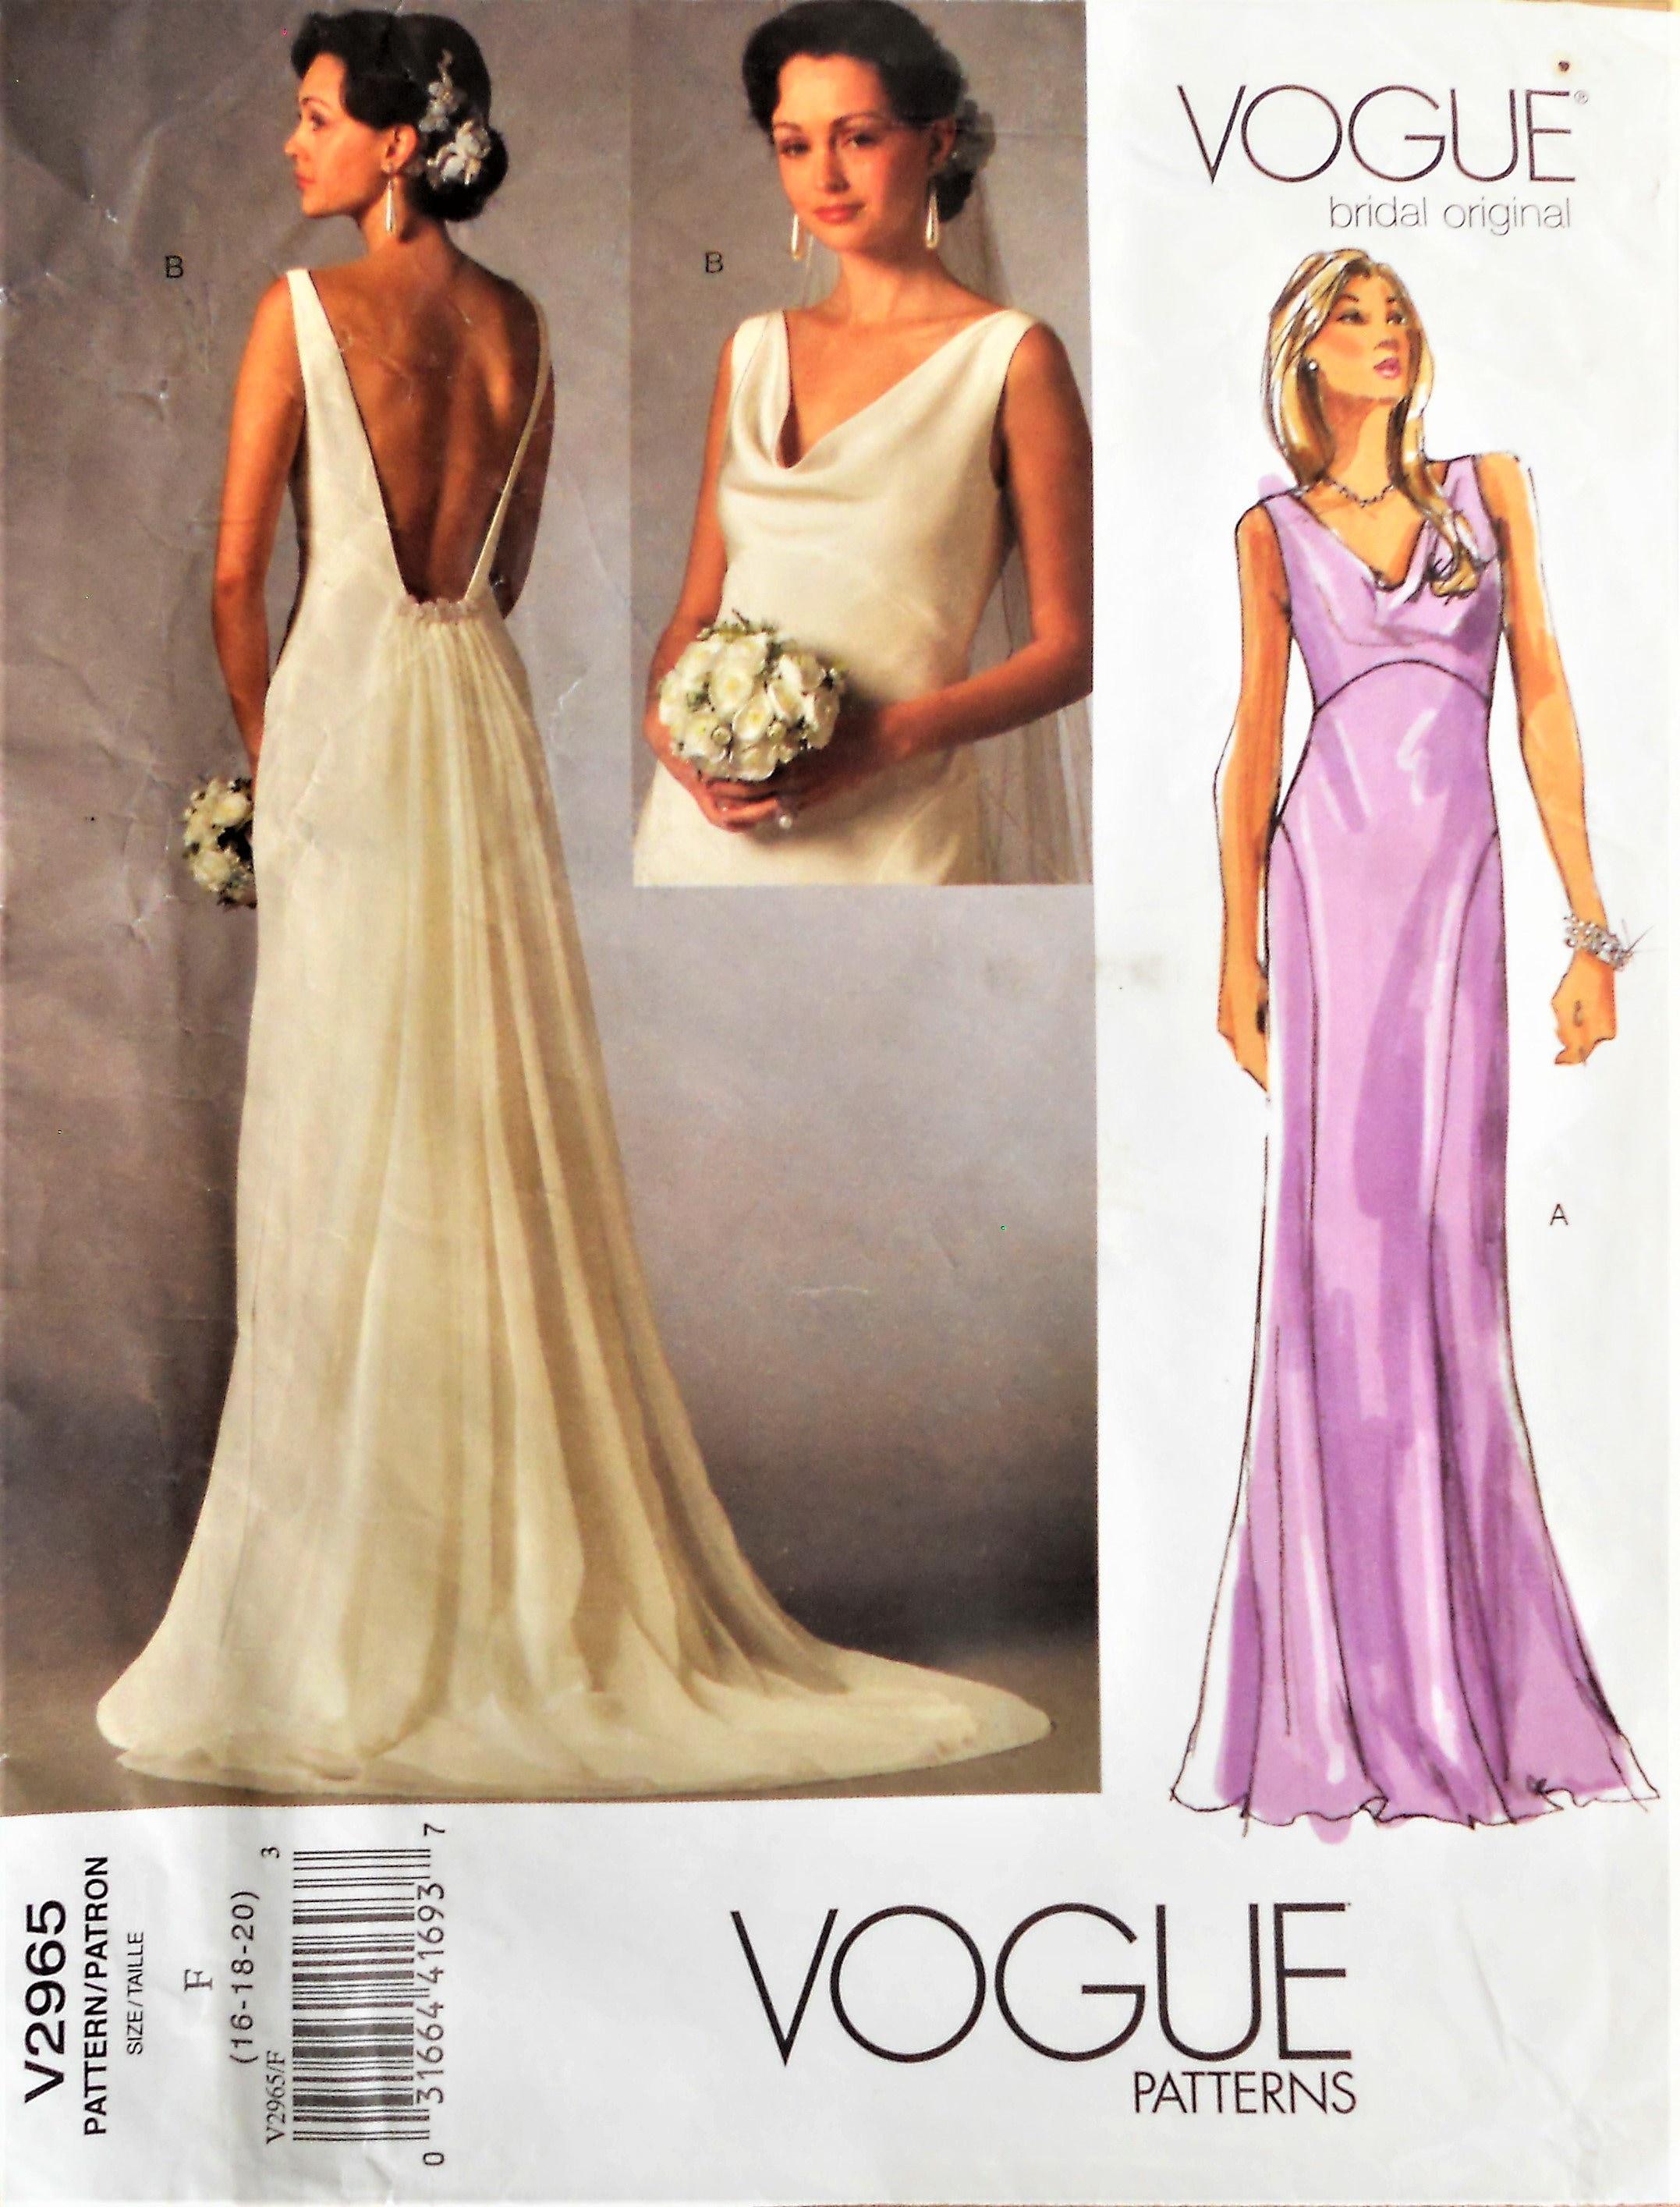 Vogue 2965 Bridal Gown Pattern Vogue Bridal Original Dress Pattern Wedding Dress Pattern Slip Style Bias Bridal Gown Fit Flare Bridal